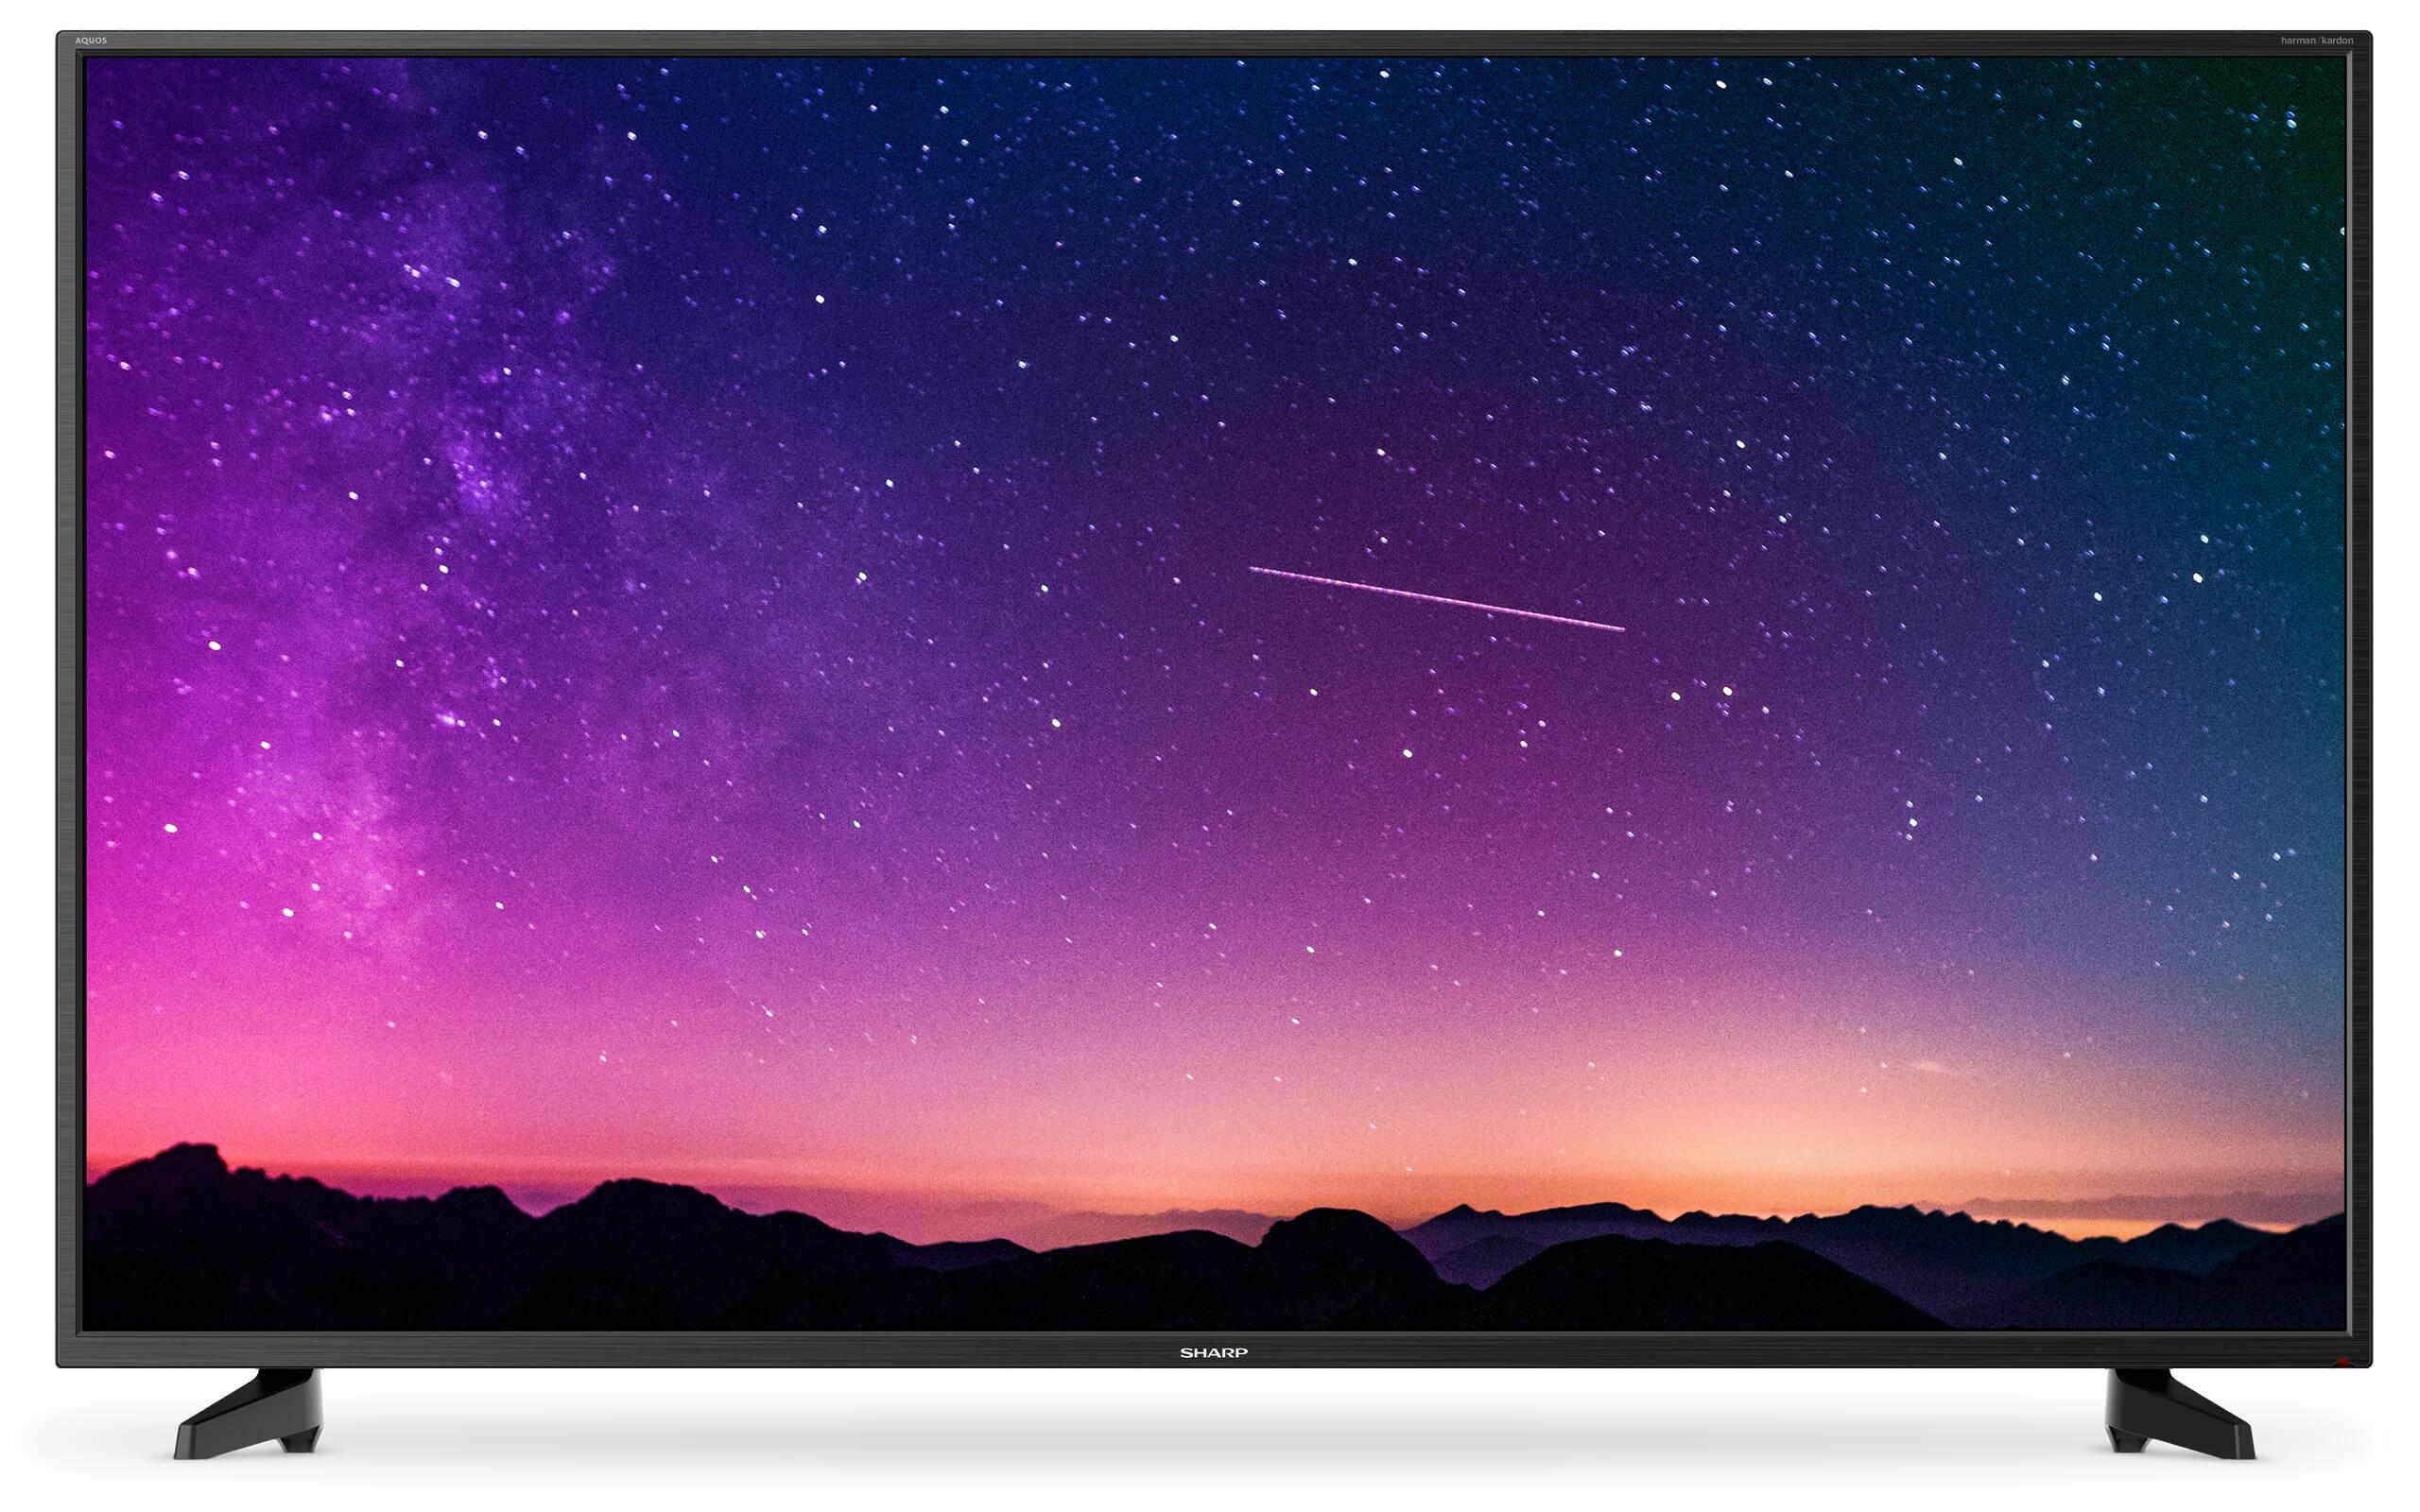 Sharp Aquos 55 inch 4K TV with Harman Kardon sound £369 instore @ Tesco Newtownards, N.I.